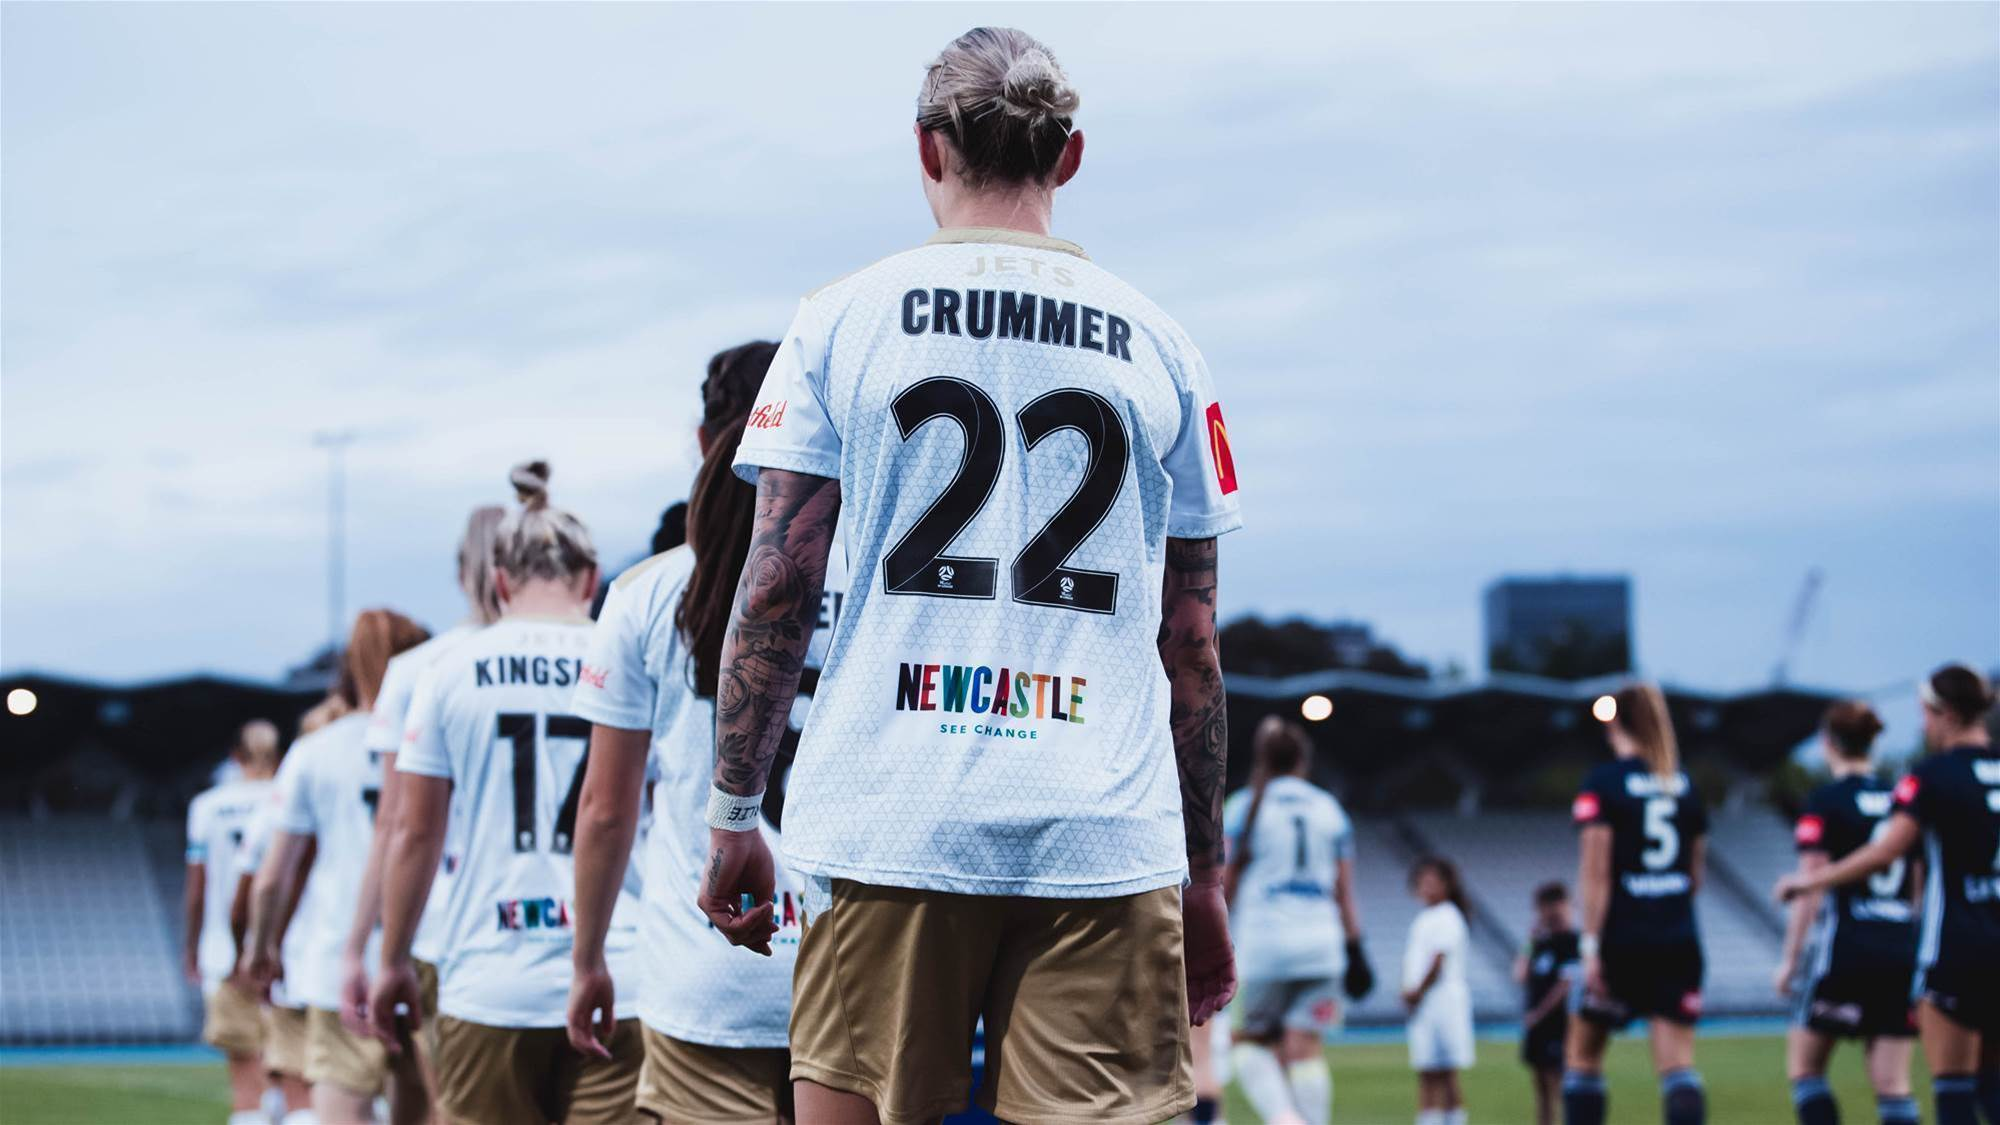 Crummer to miss Canberra match